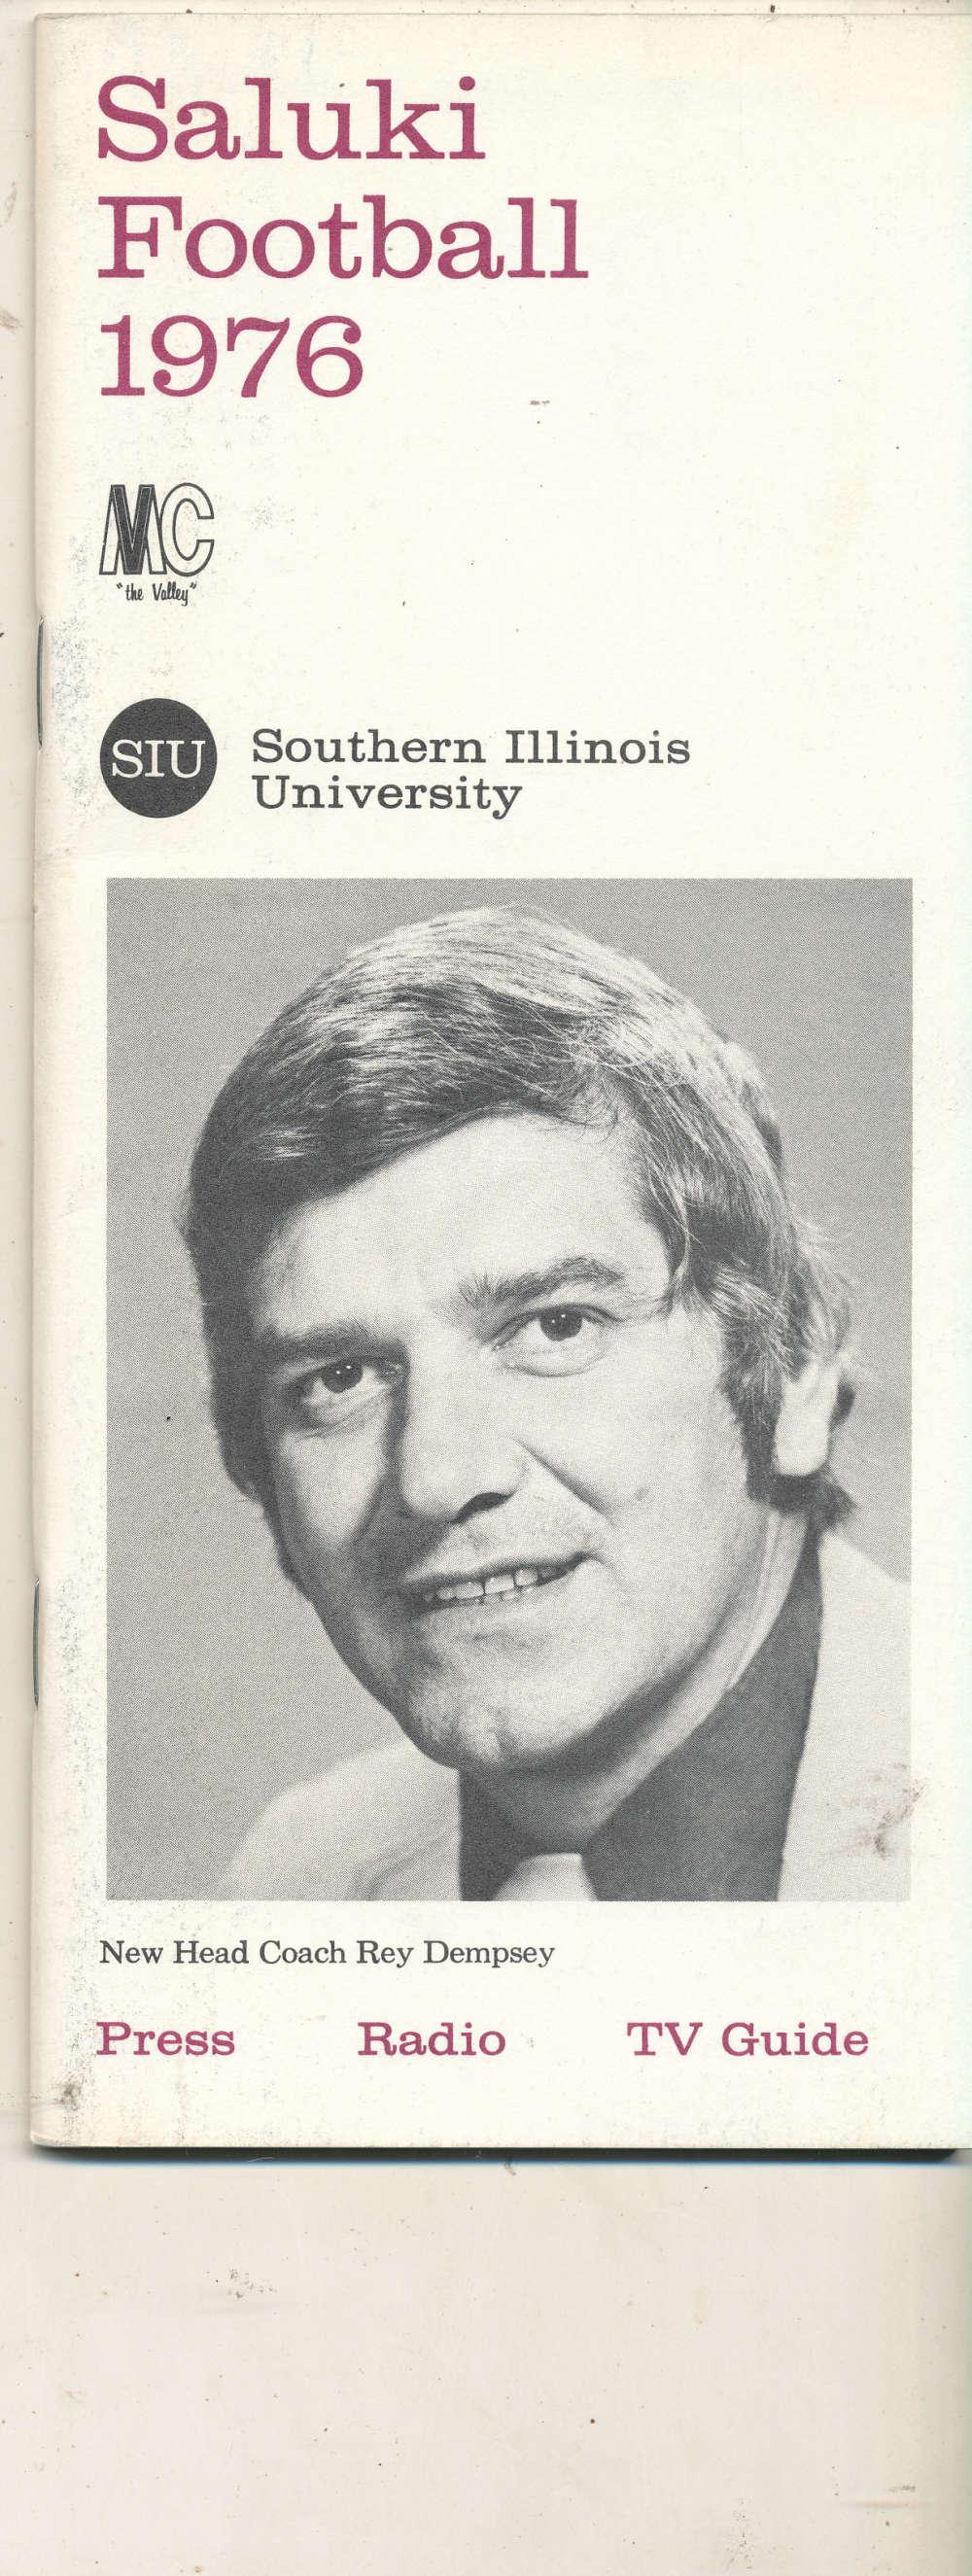 1976 SIU Southern Illinois University Football Media Press Guide